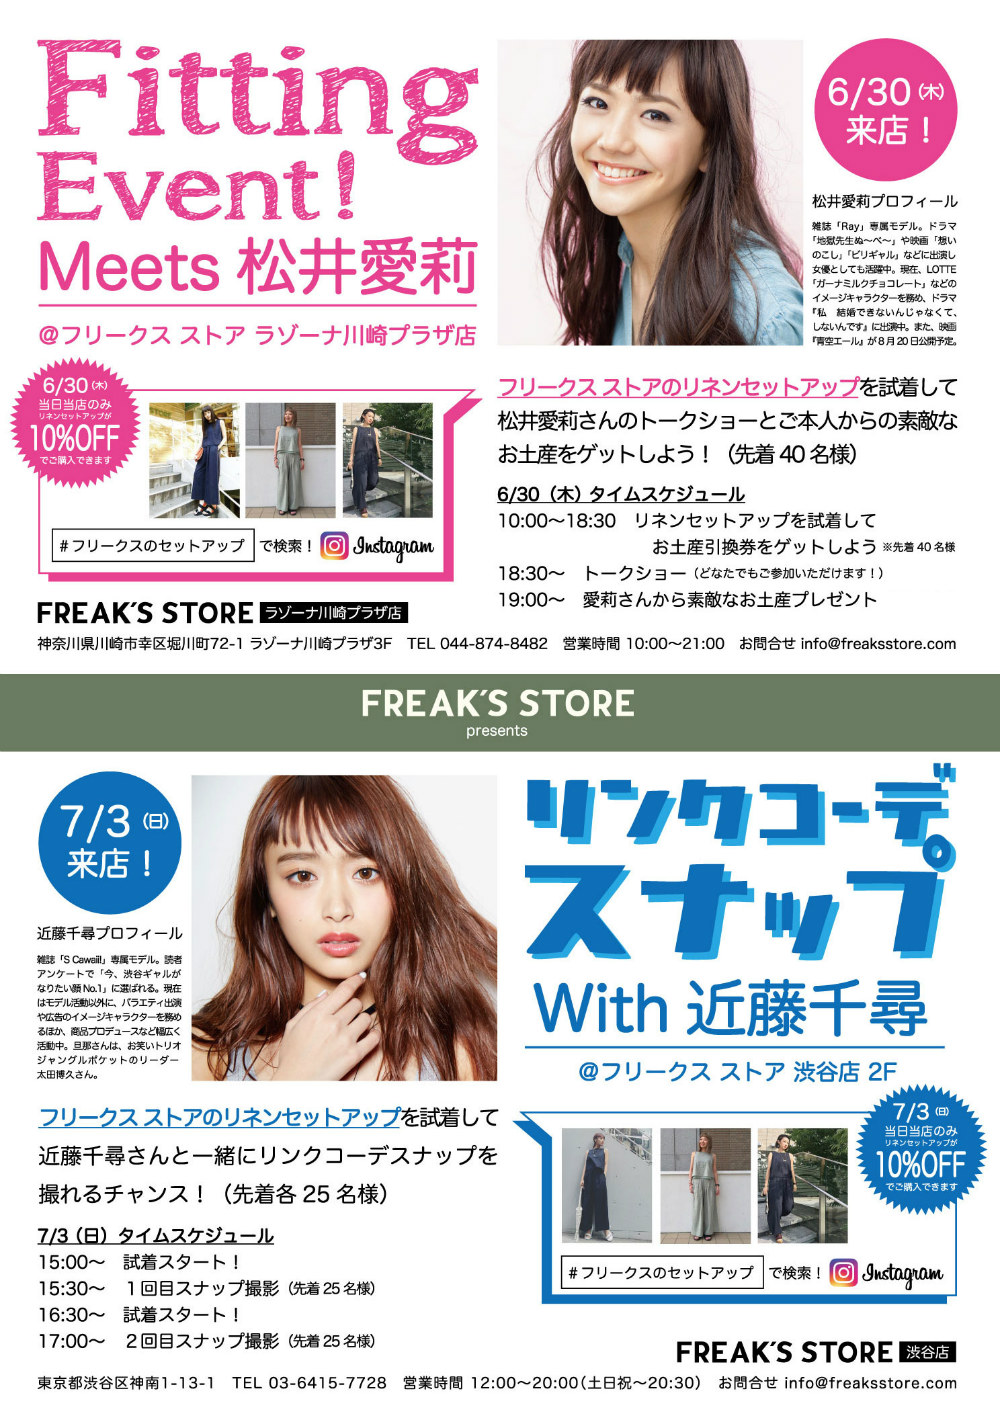 松井愛莉 & 近藤千尋 来店!FREAK'S STORE・FITTING EVENT